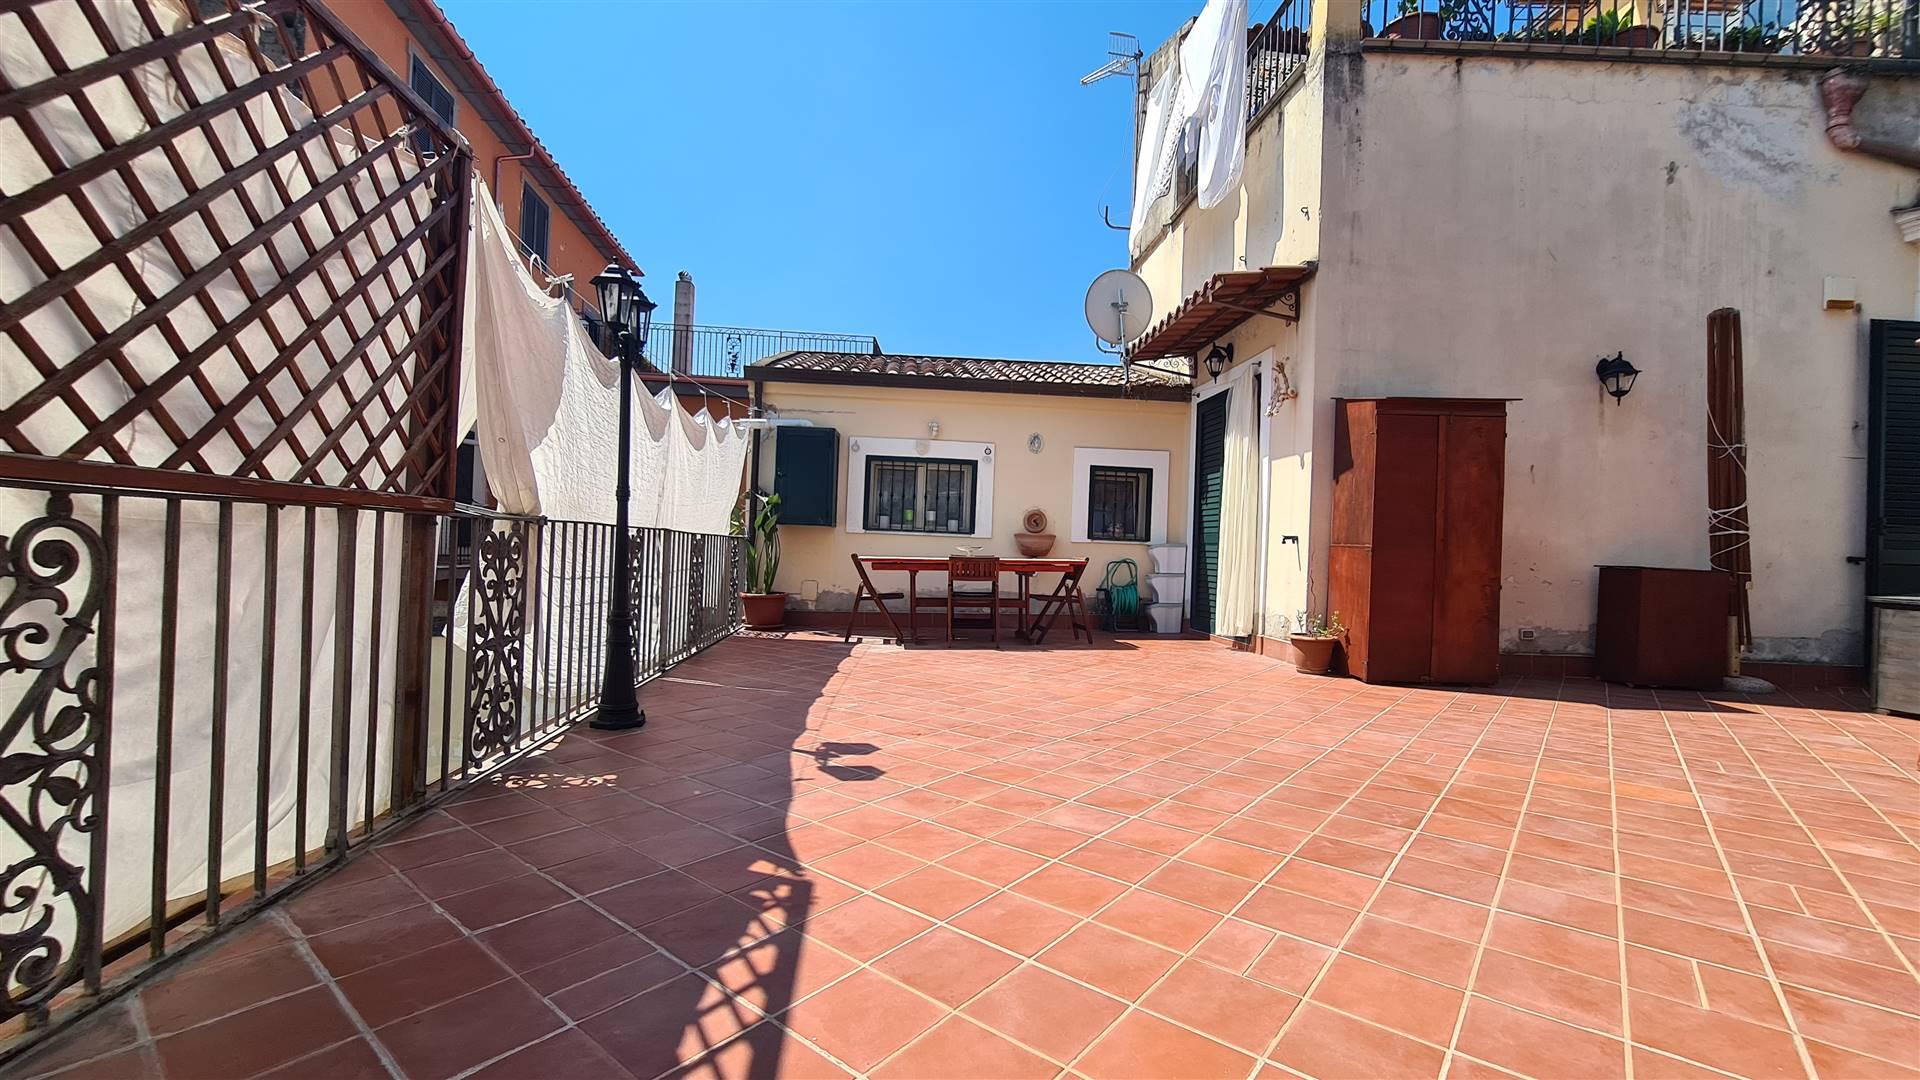 AV973A-Appartamento-SANTA-MARIA-CAPUA-VETERE-Via-Roma